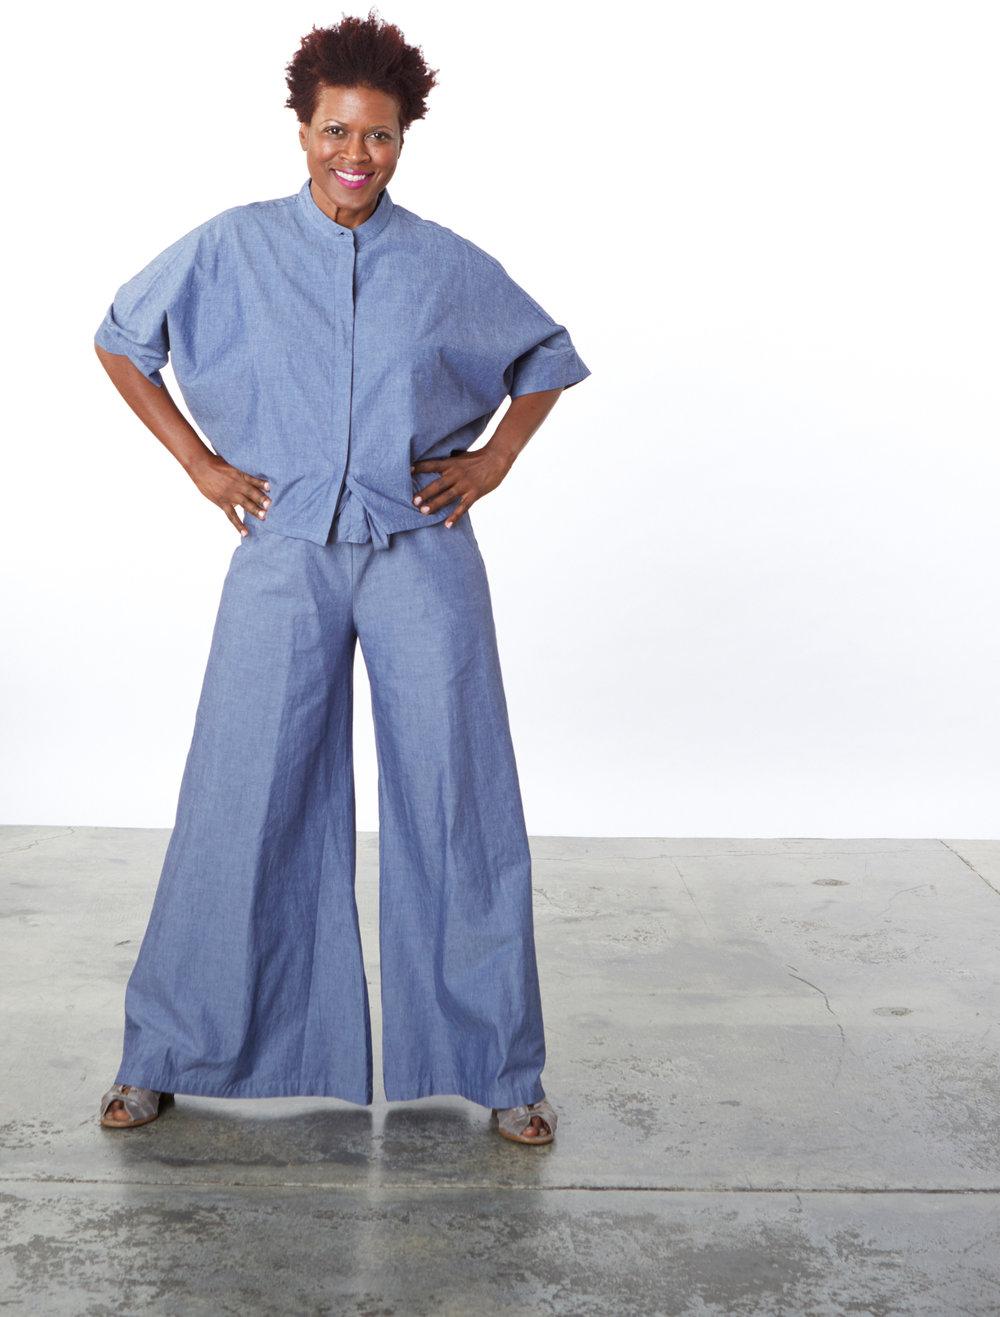 Joe Shirt, Tie Waist Pant in Oia Cotton Chambray